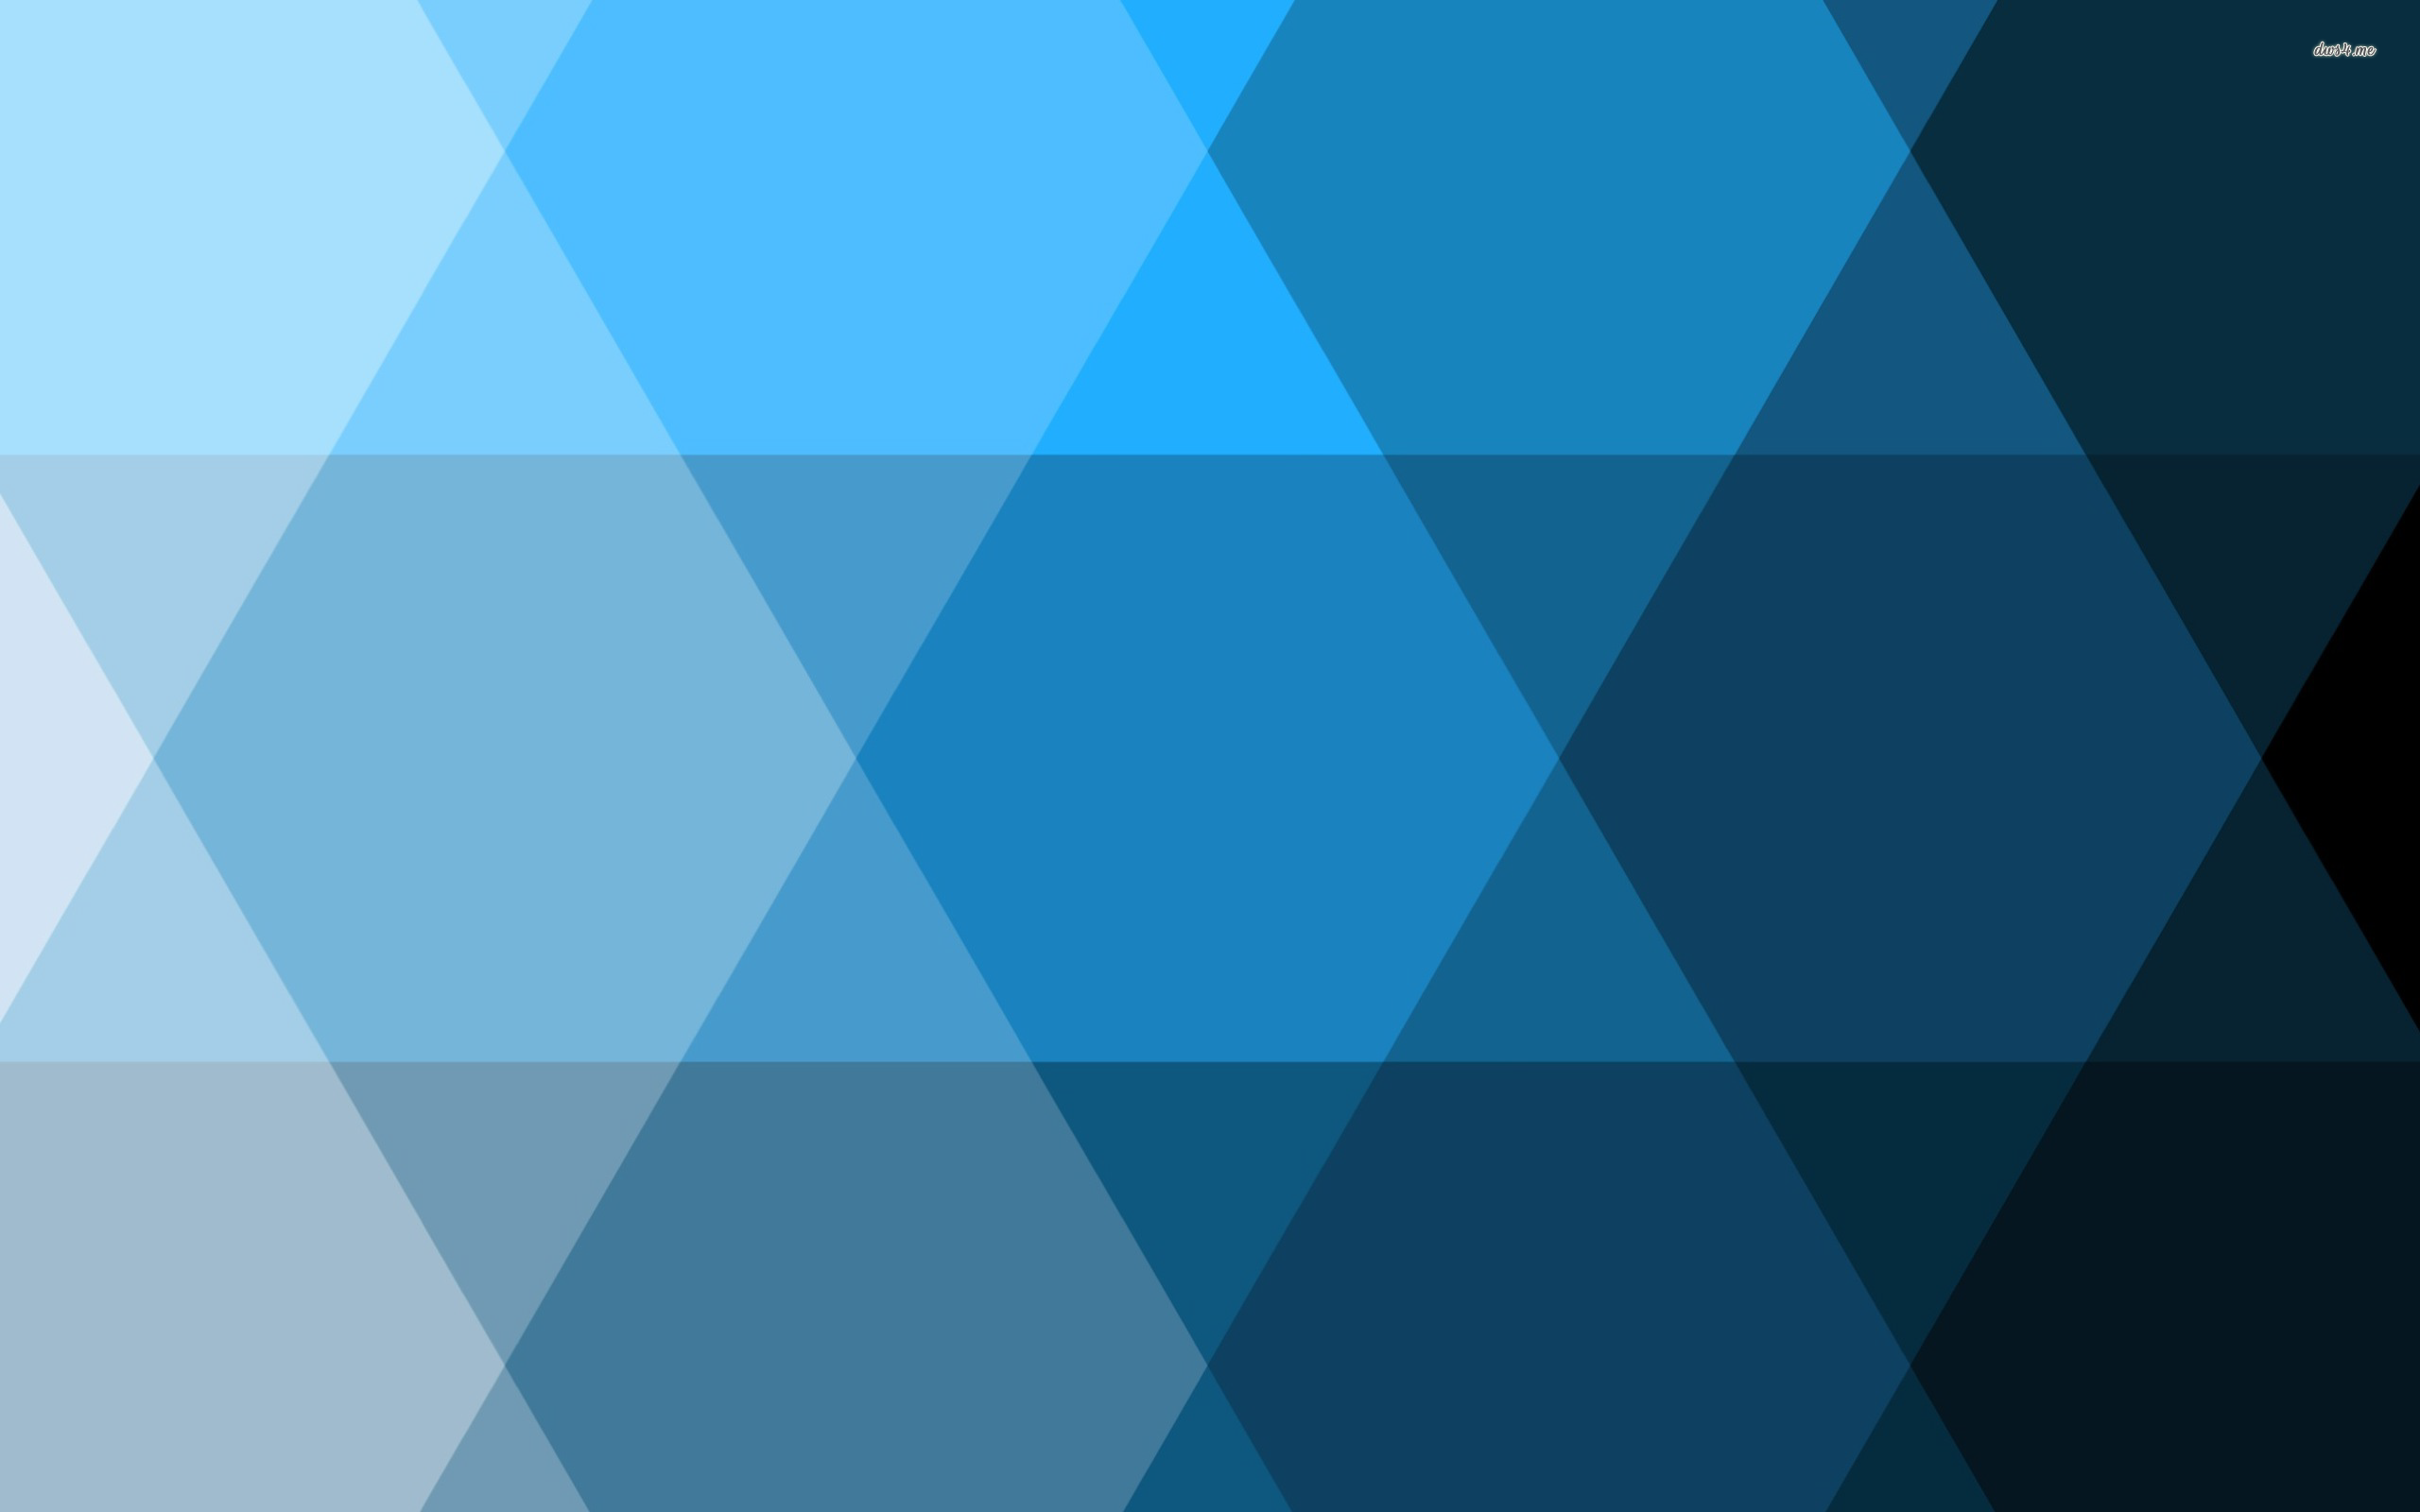 Blue diamond pattern HD wallpaper | Vector Desktop Wallpaper - Blue Diamond PNG HD